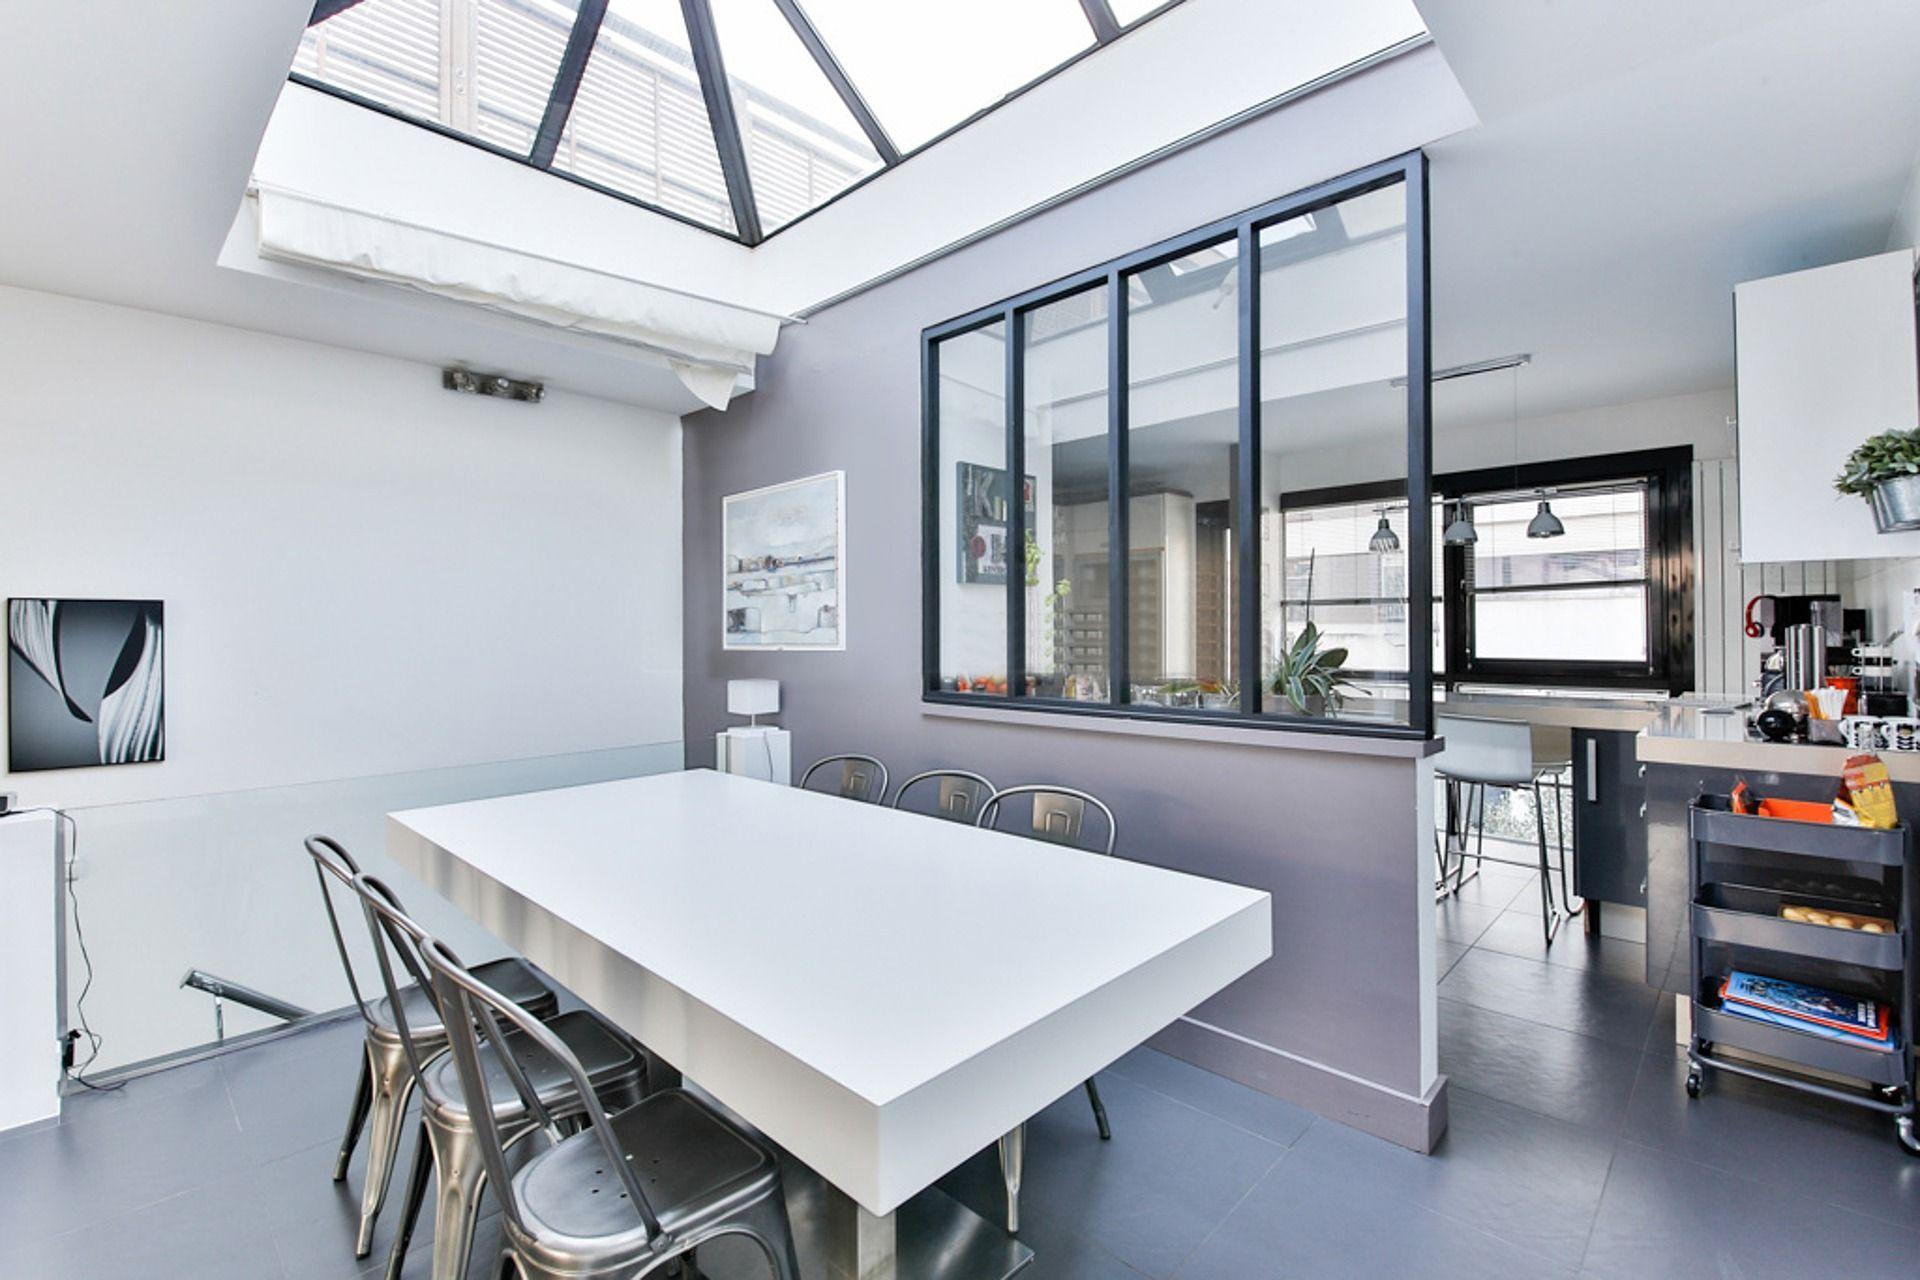 Home in 2018 | Dinning Room | Pinterest | Innovative ideas, Ceilings ...